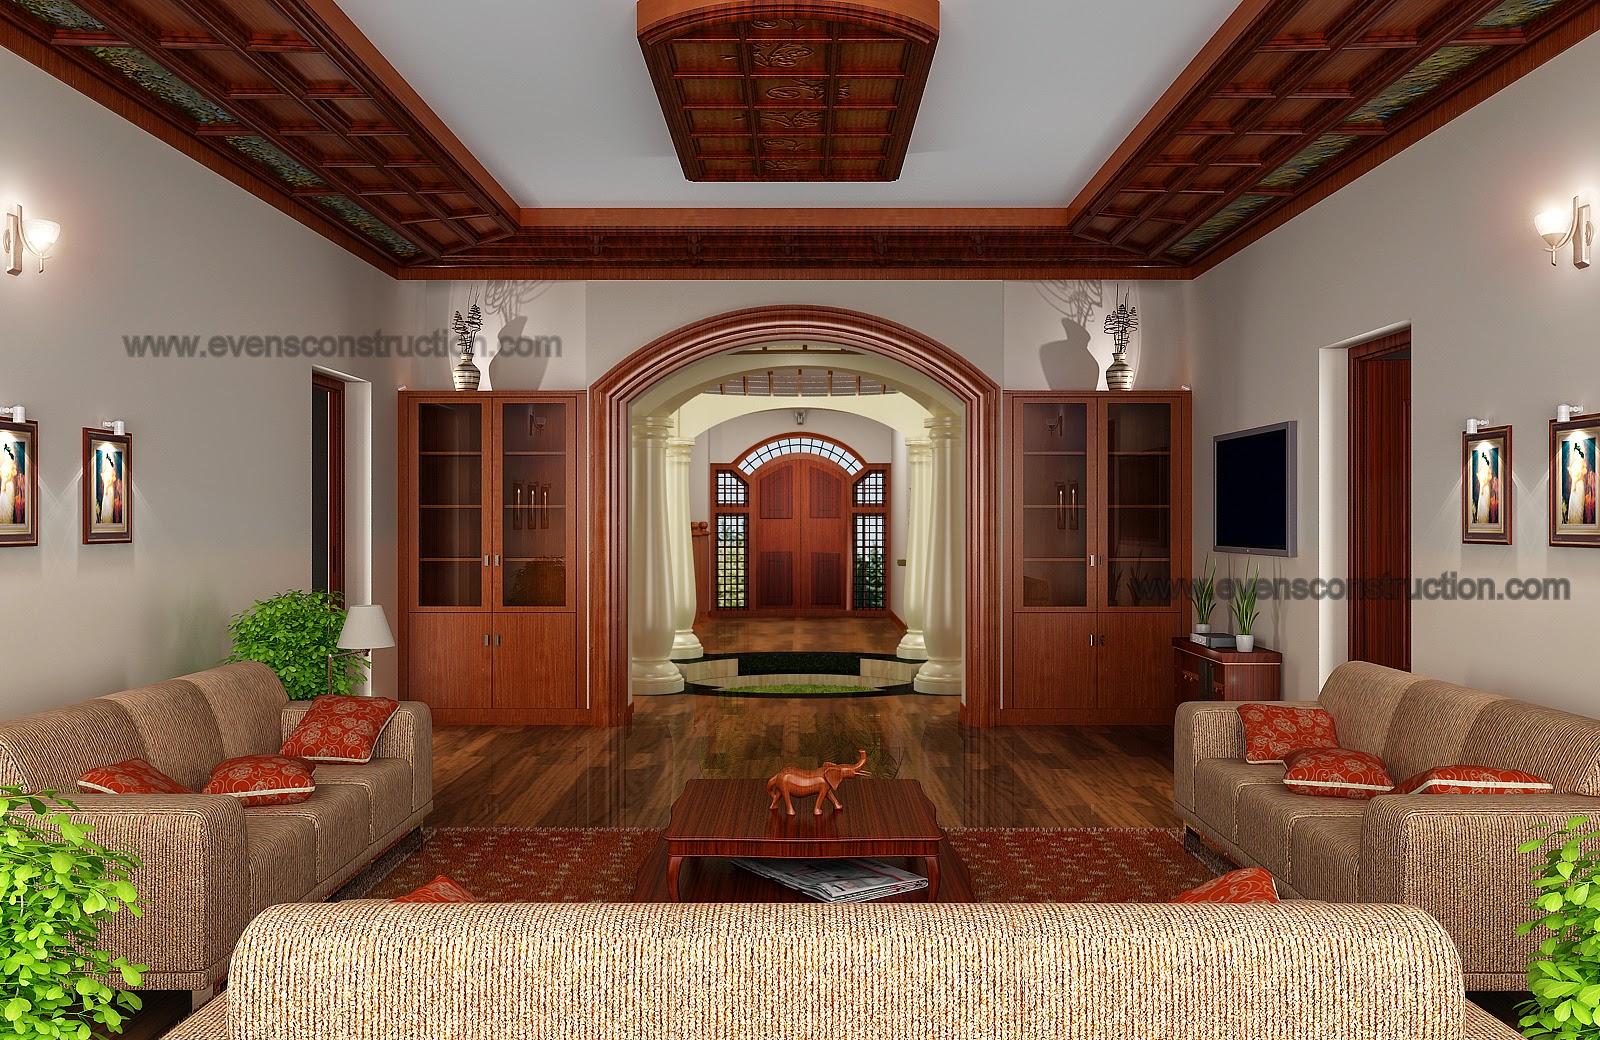 Evens construction pvt ltd modern kerala living room for Modern living room in kerala